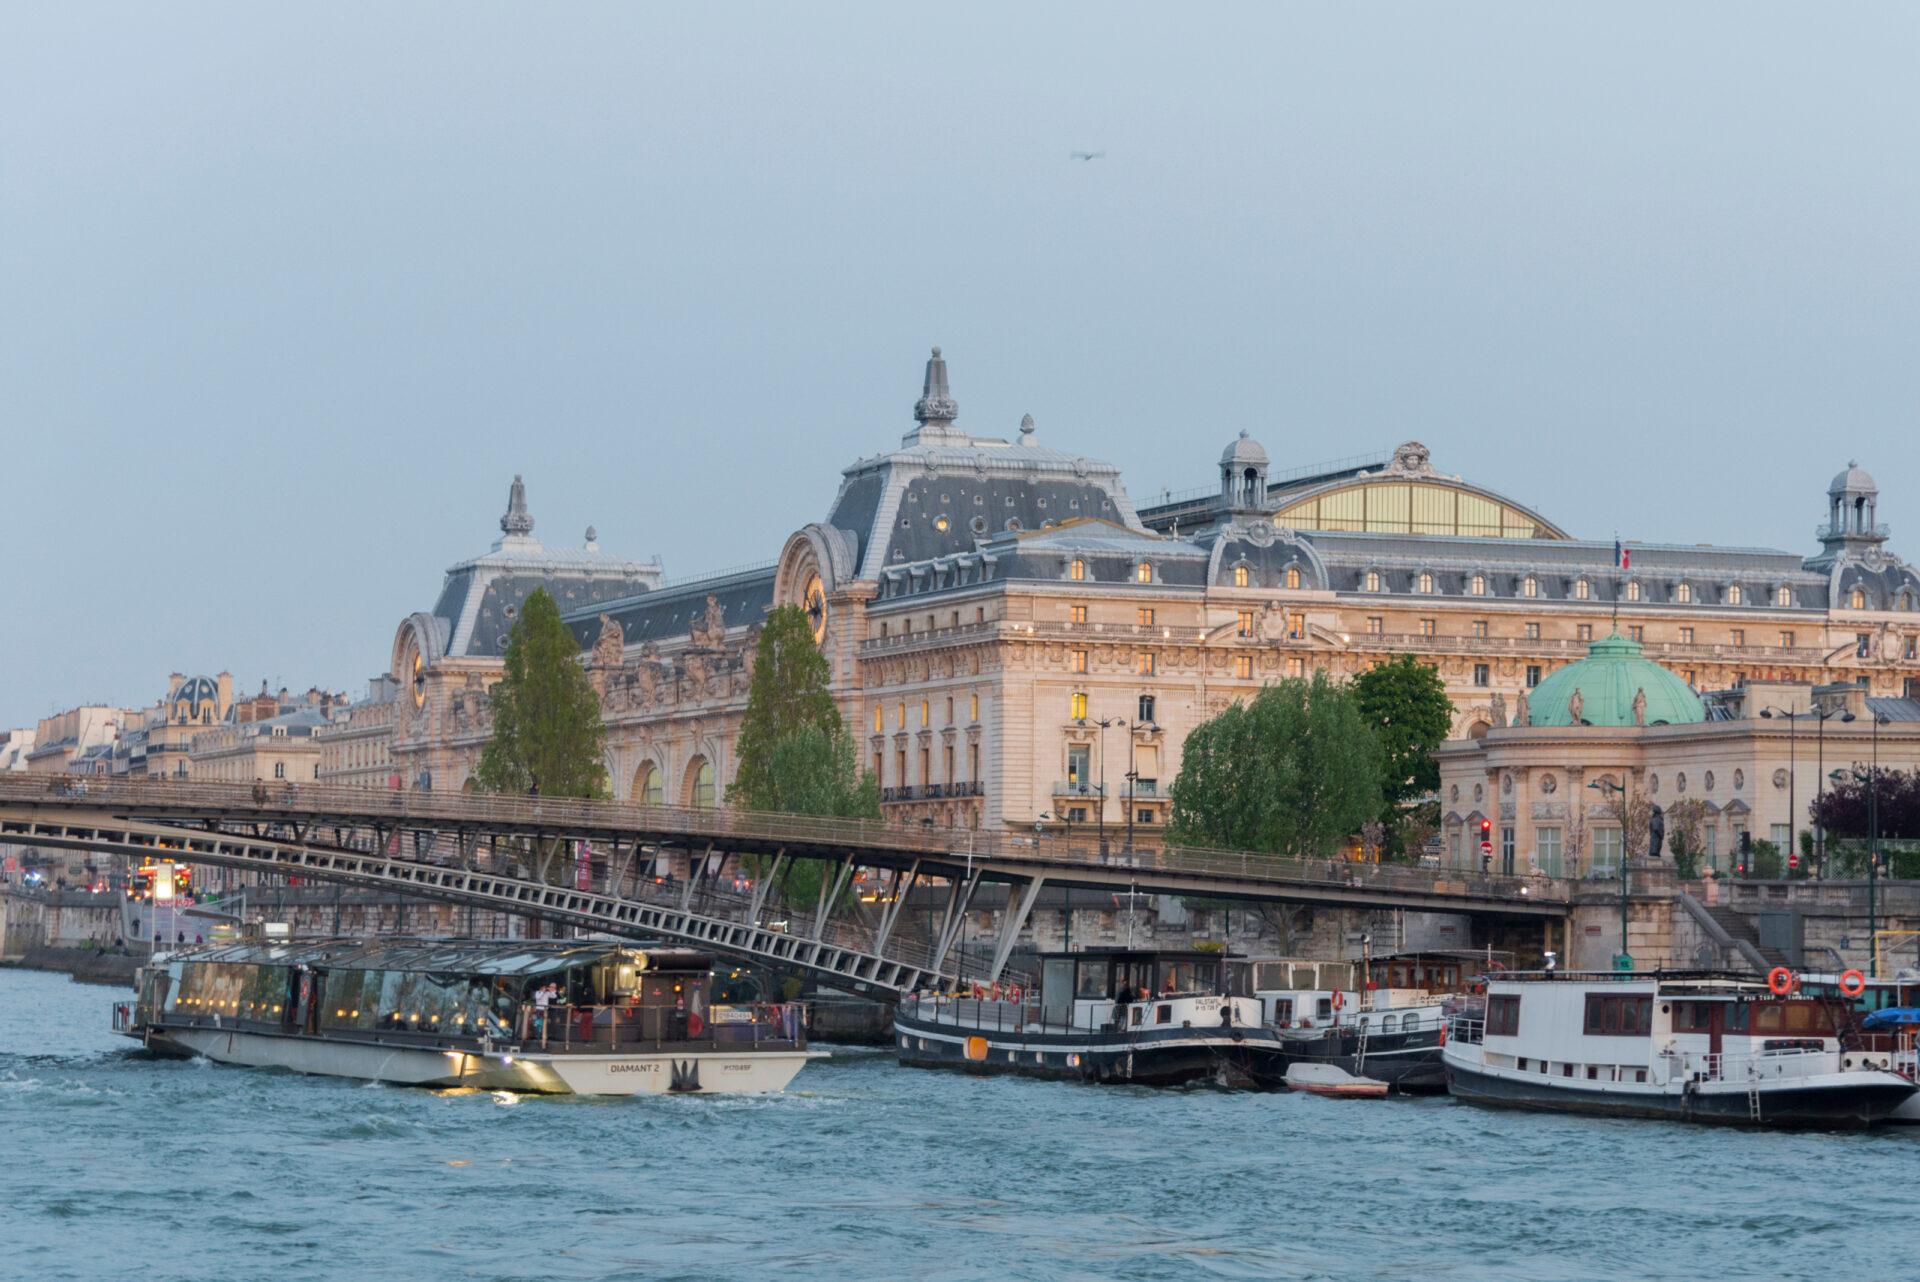 Париж запару дней допожара вНотр Даме. Часть 1.